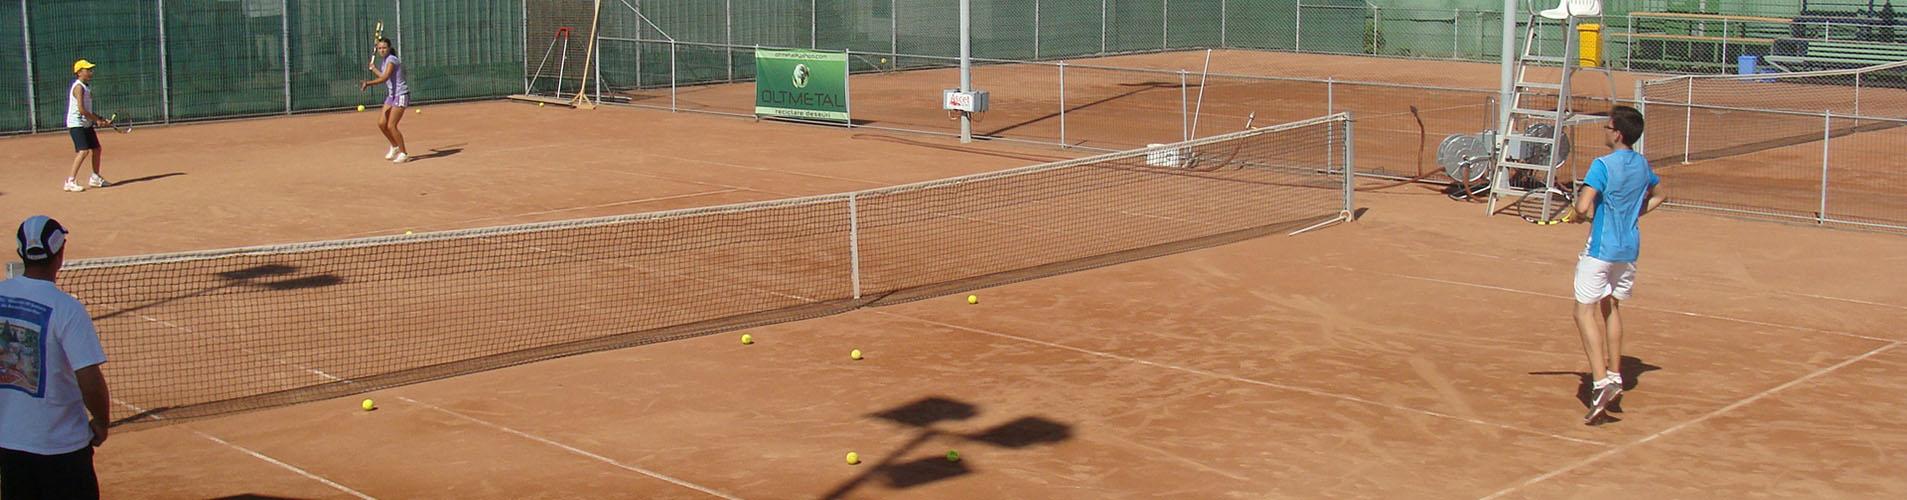 Copii antrenandu-se pe un teren de tenis sub indrumarea antrenorului